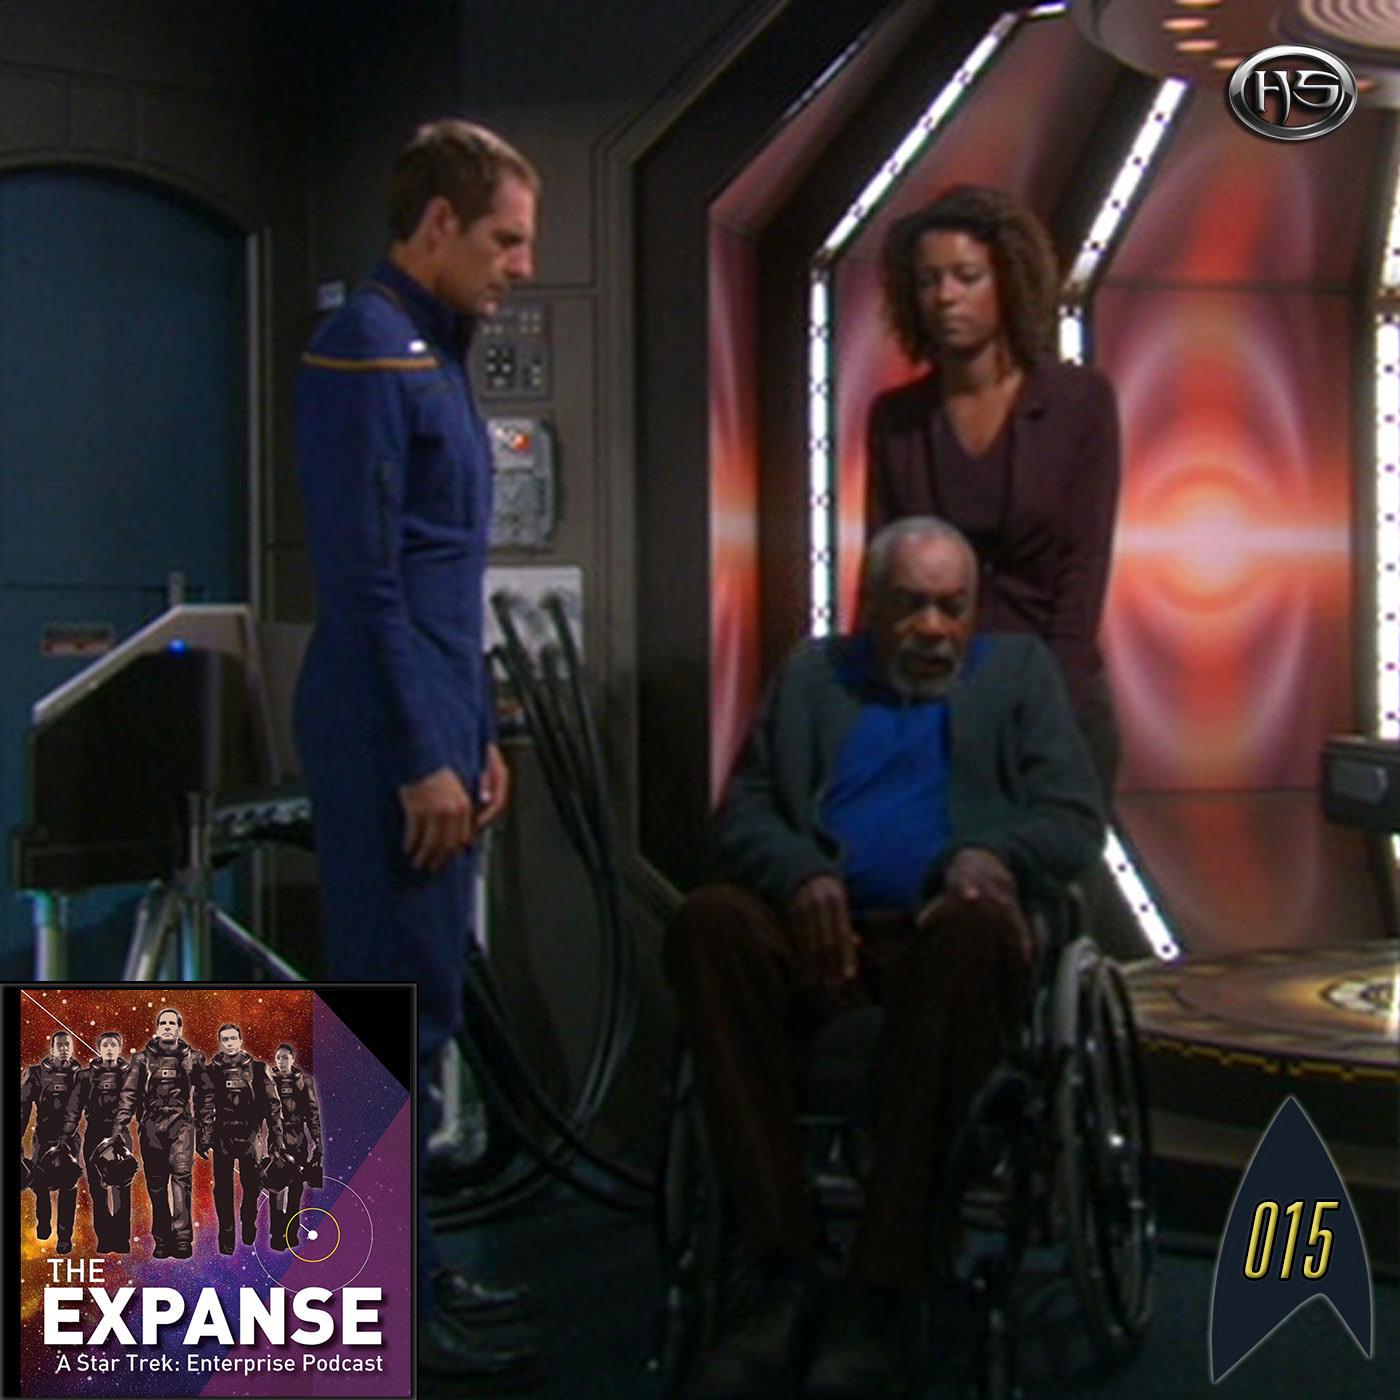 The Expanse Episode 15